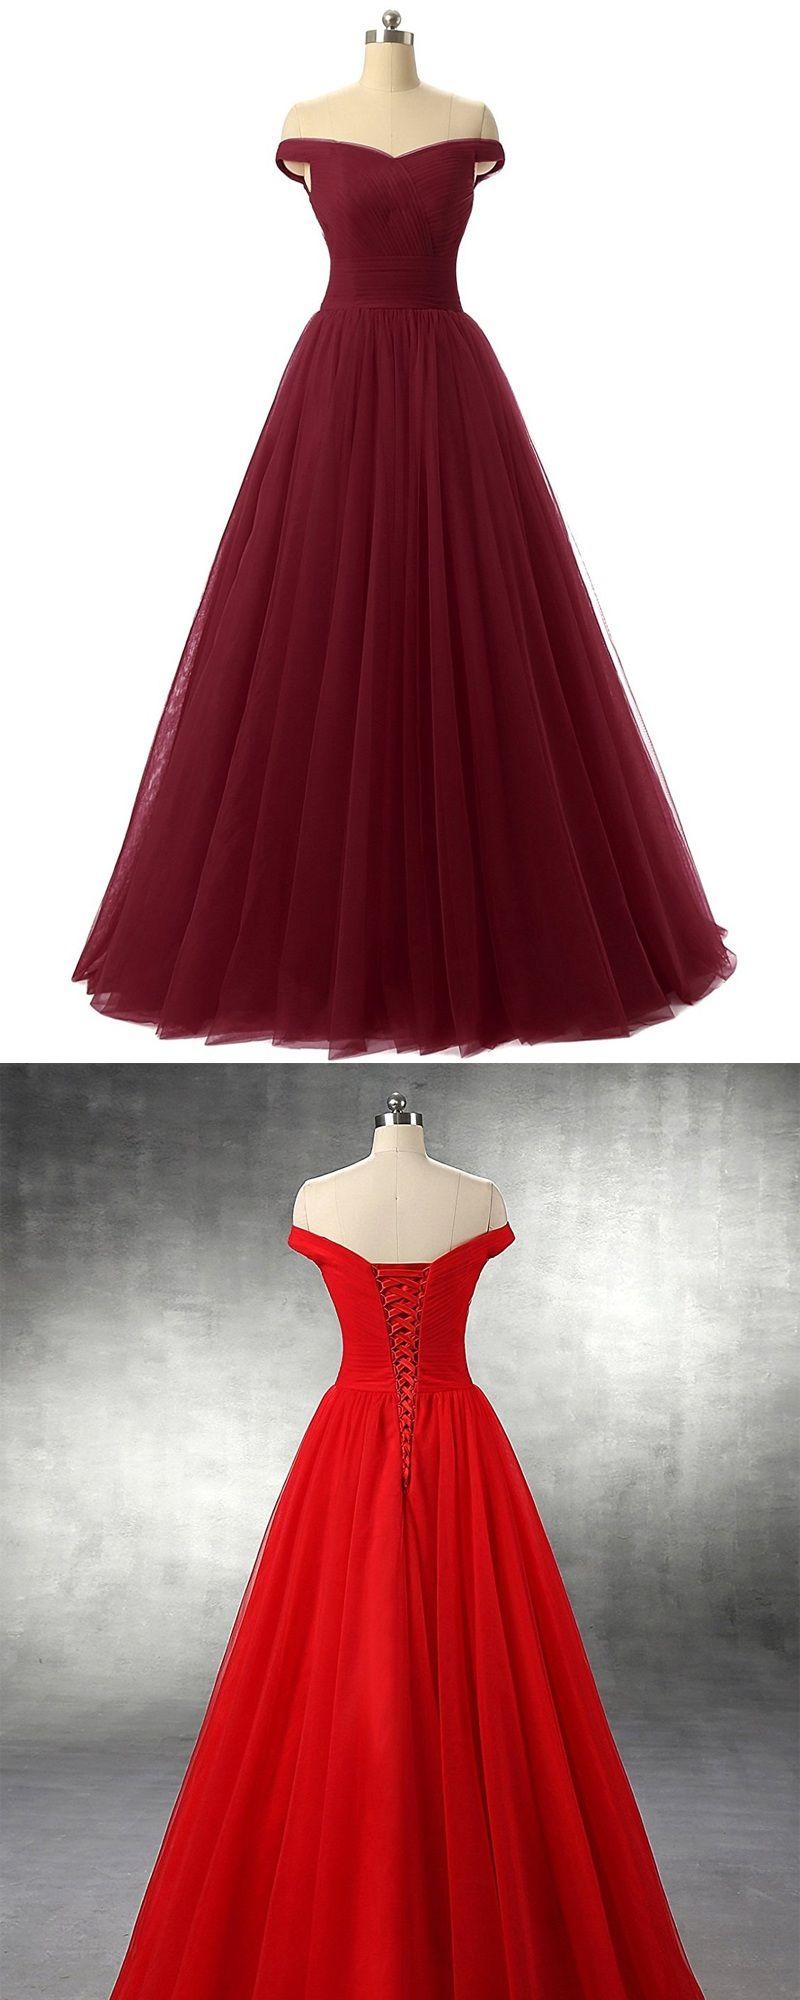 Aline tulle prom formal evening dresssexy burgundy prom dresses